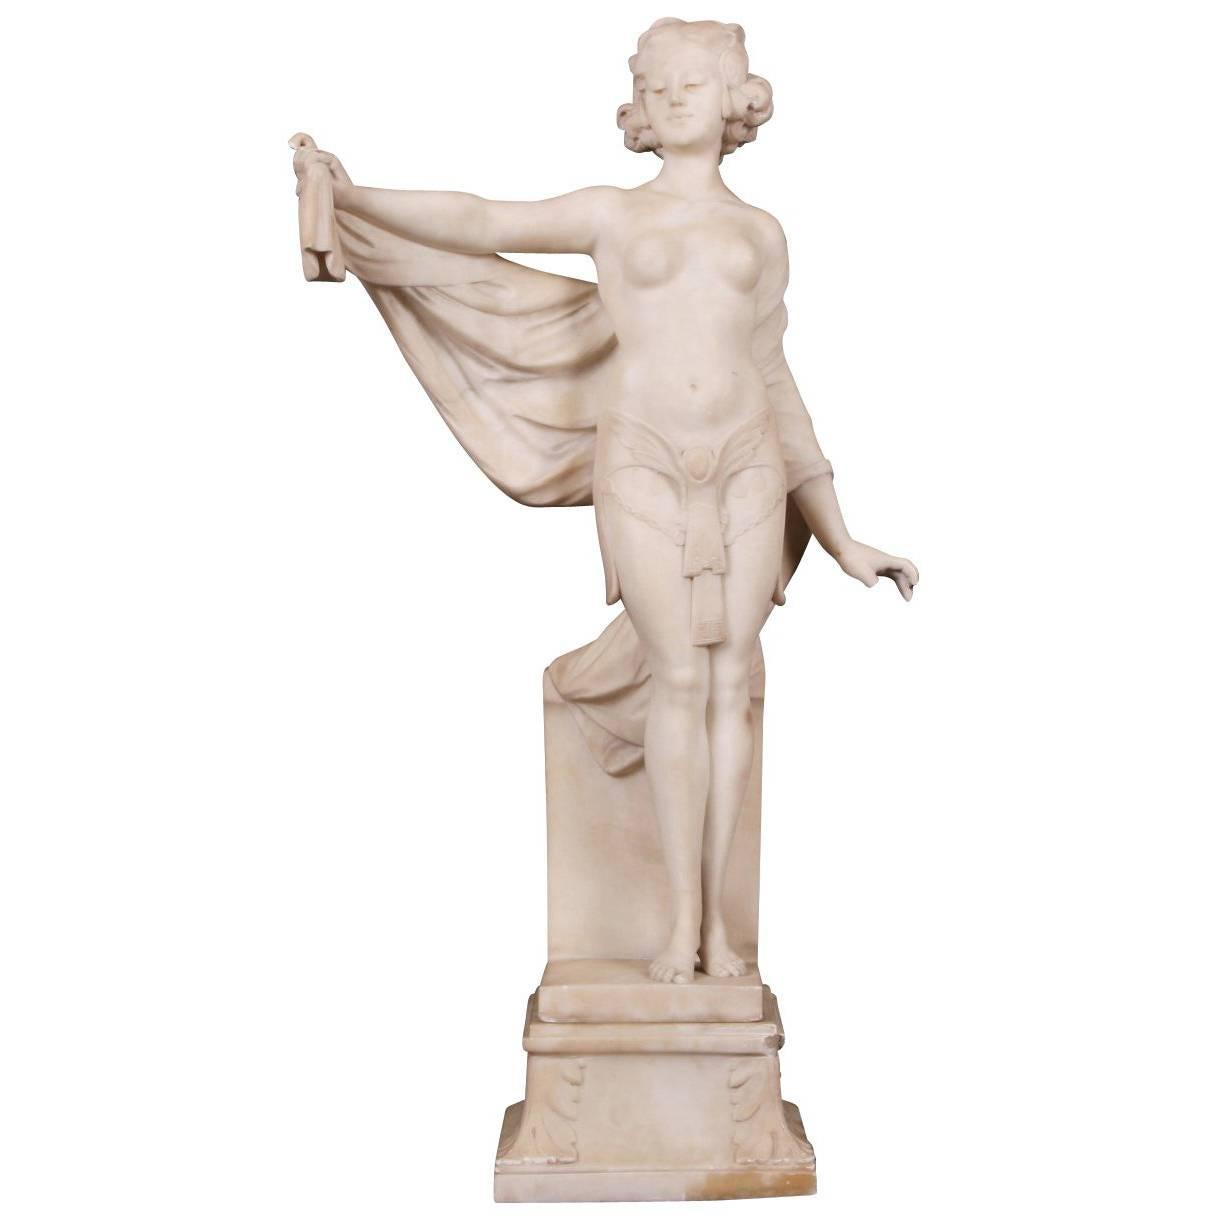 Adolpho Cipriani 'Italian, Active 1880-1930' Alabaster Figure